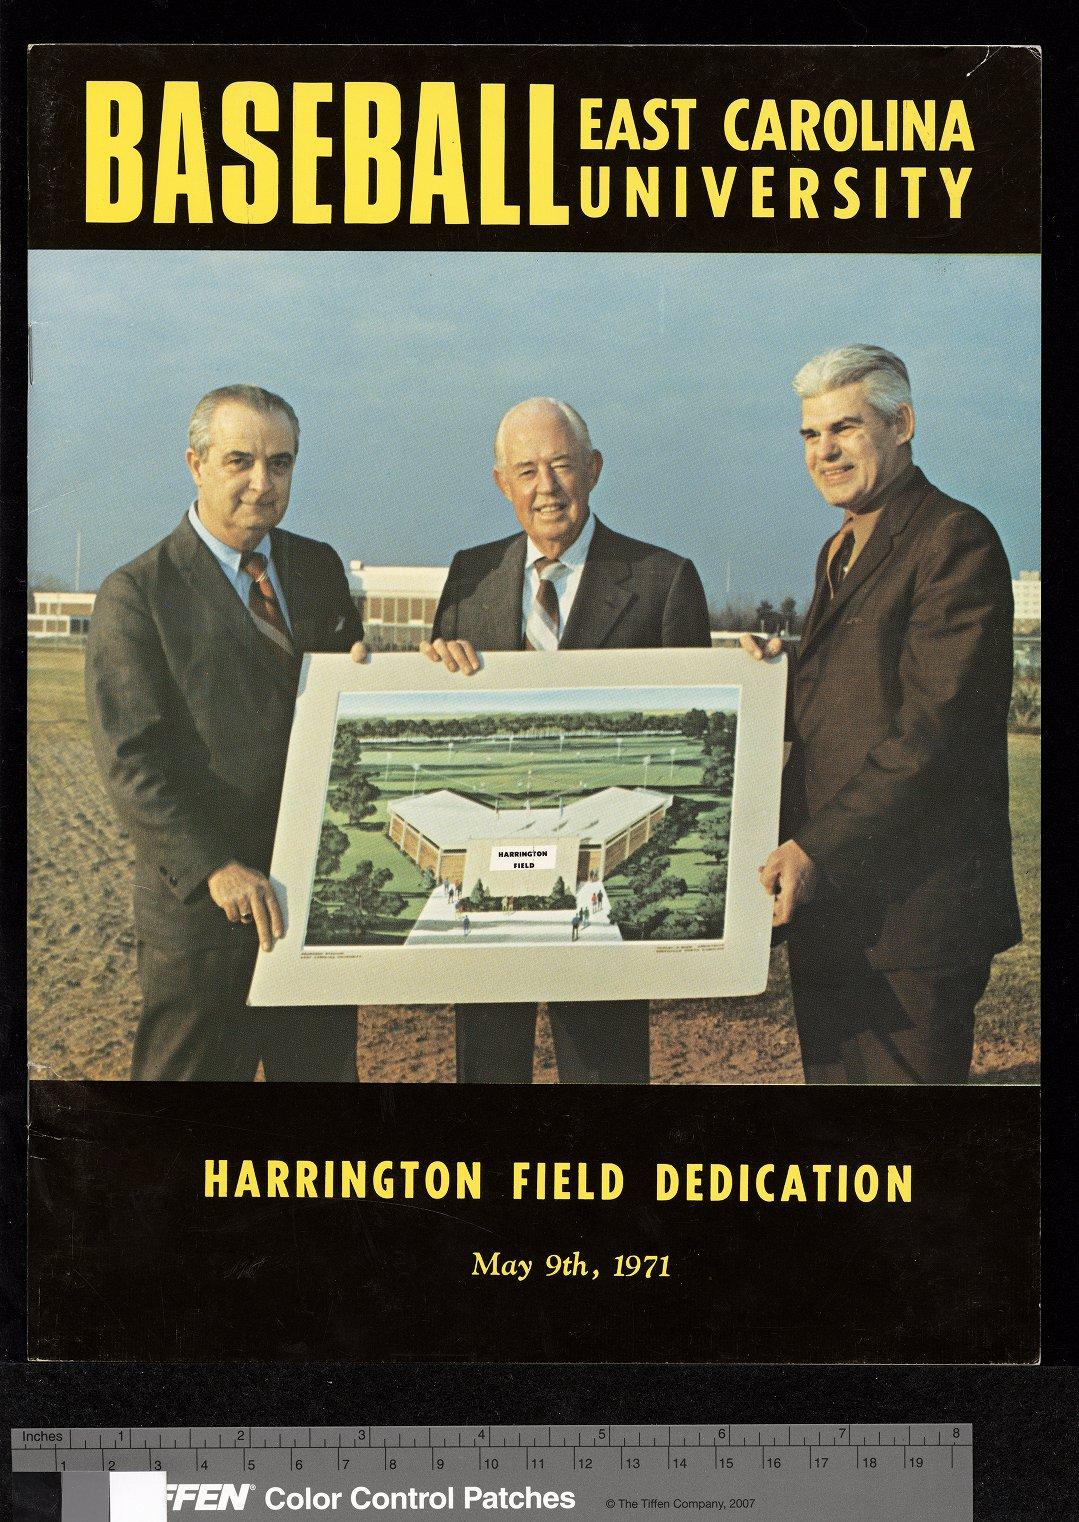 Harrington Field Dedication https://digital.lib.ecu.edu/17125